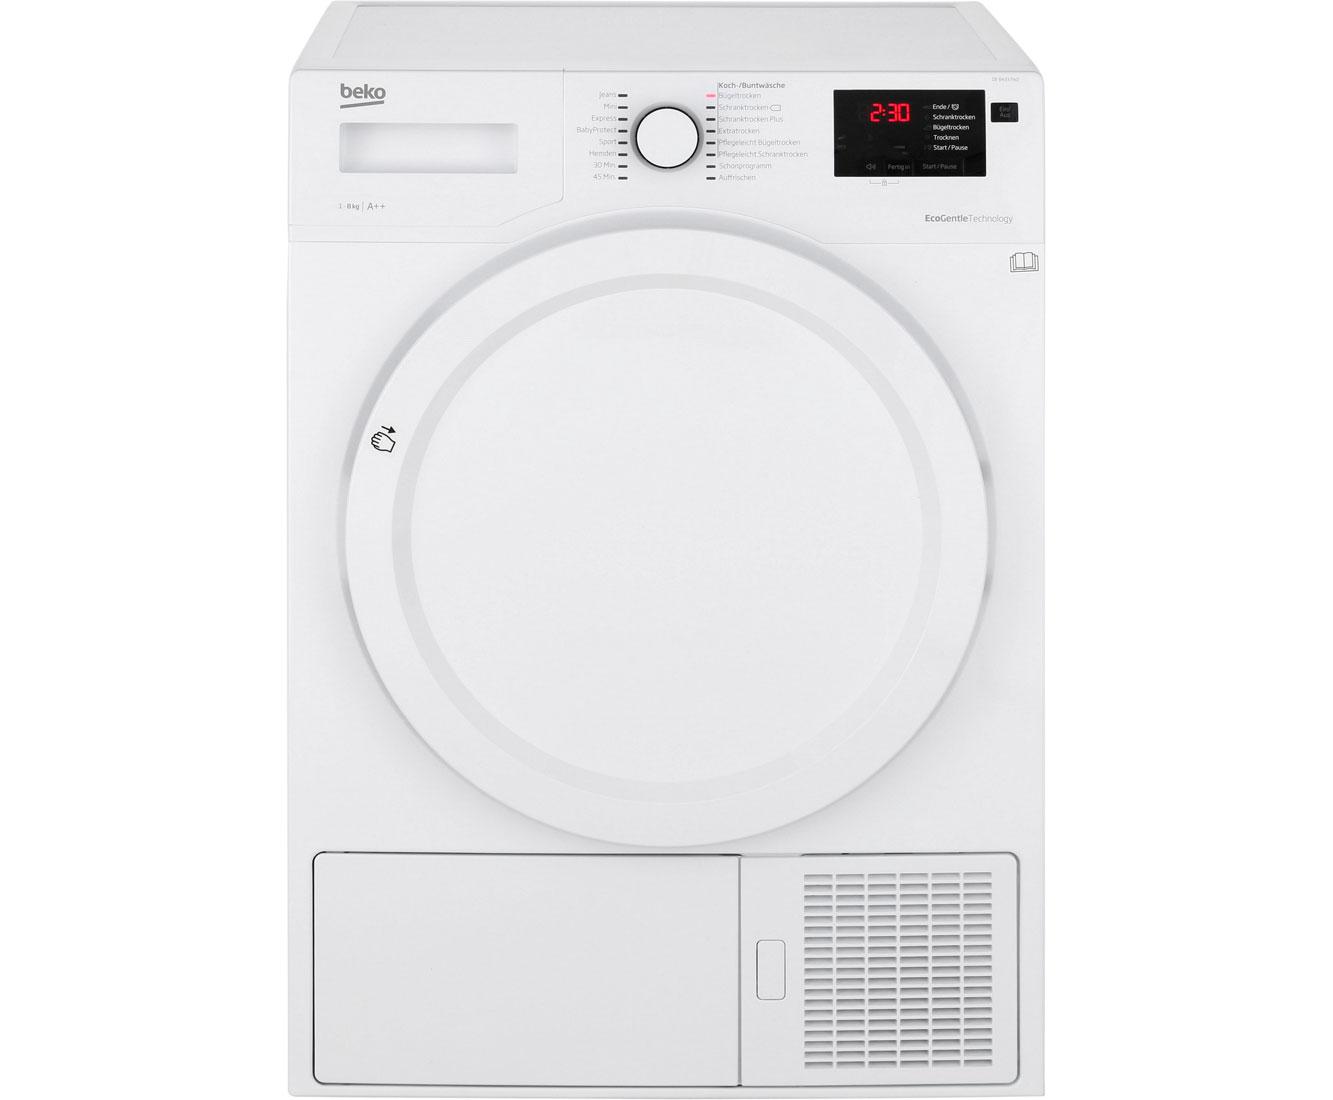 Beko DE8433PA0 Wärmepumpentrockner - Weiss | Bad > Waschmaschinen und Trockner | Weiss | Beko